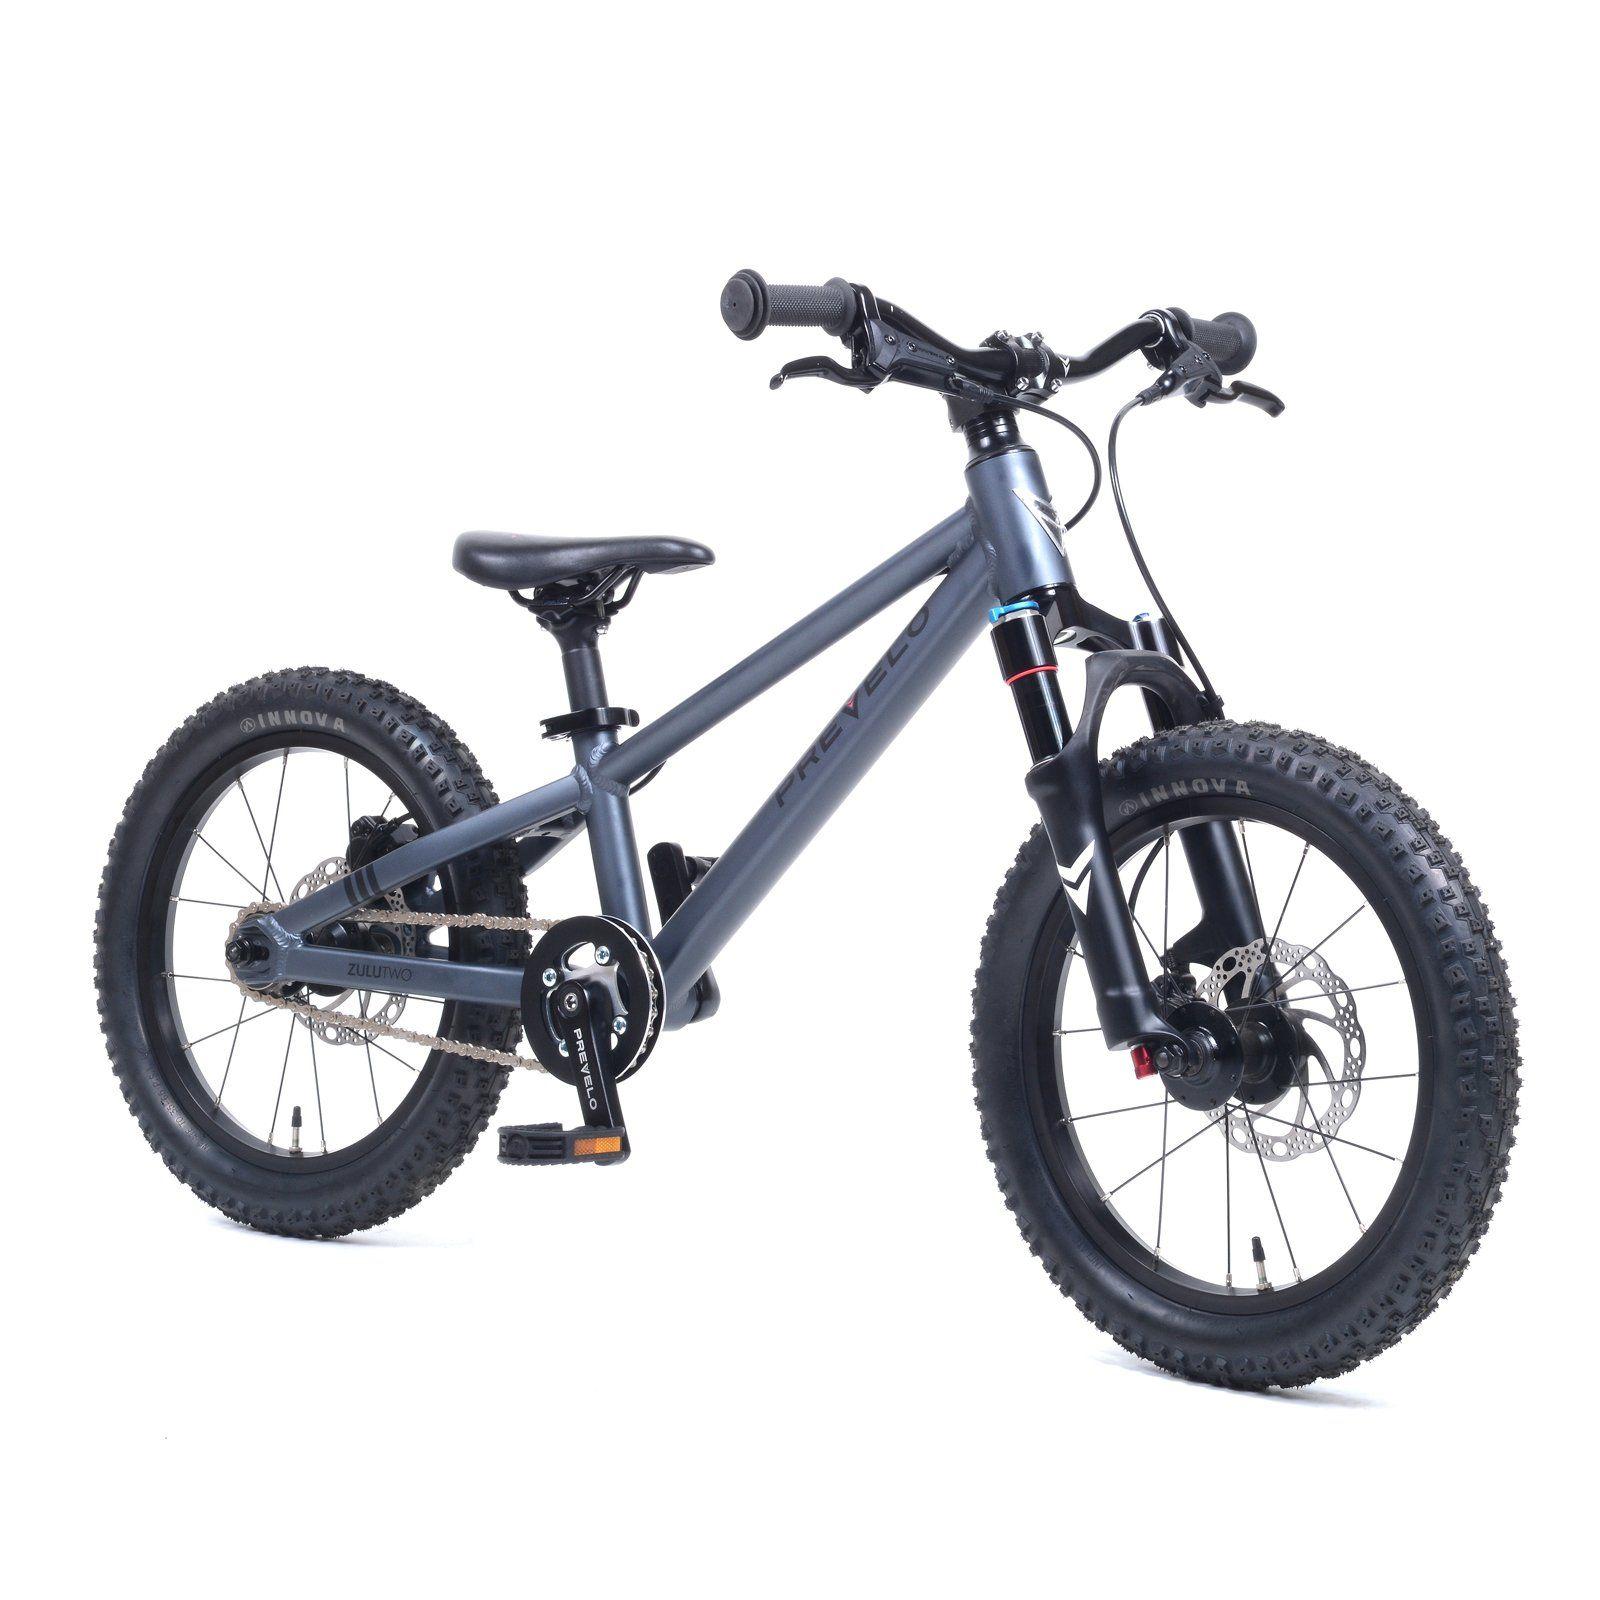 Zulu Two Kids Mountain Bikes Bike Kids Bike